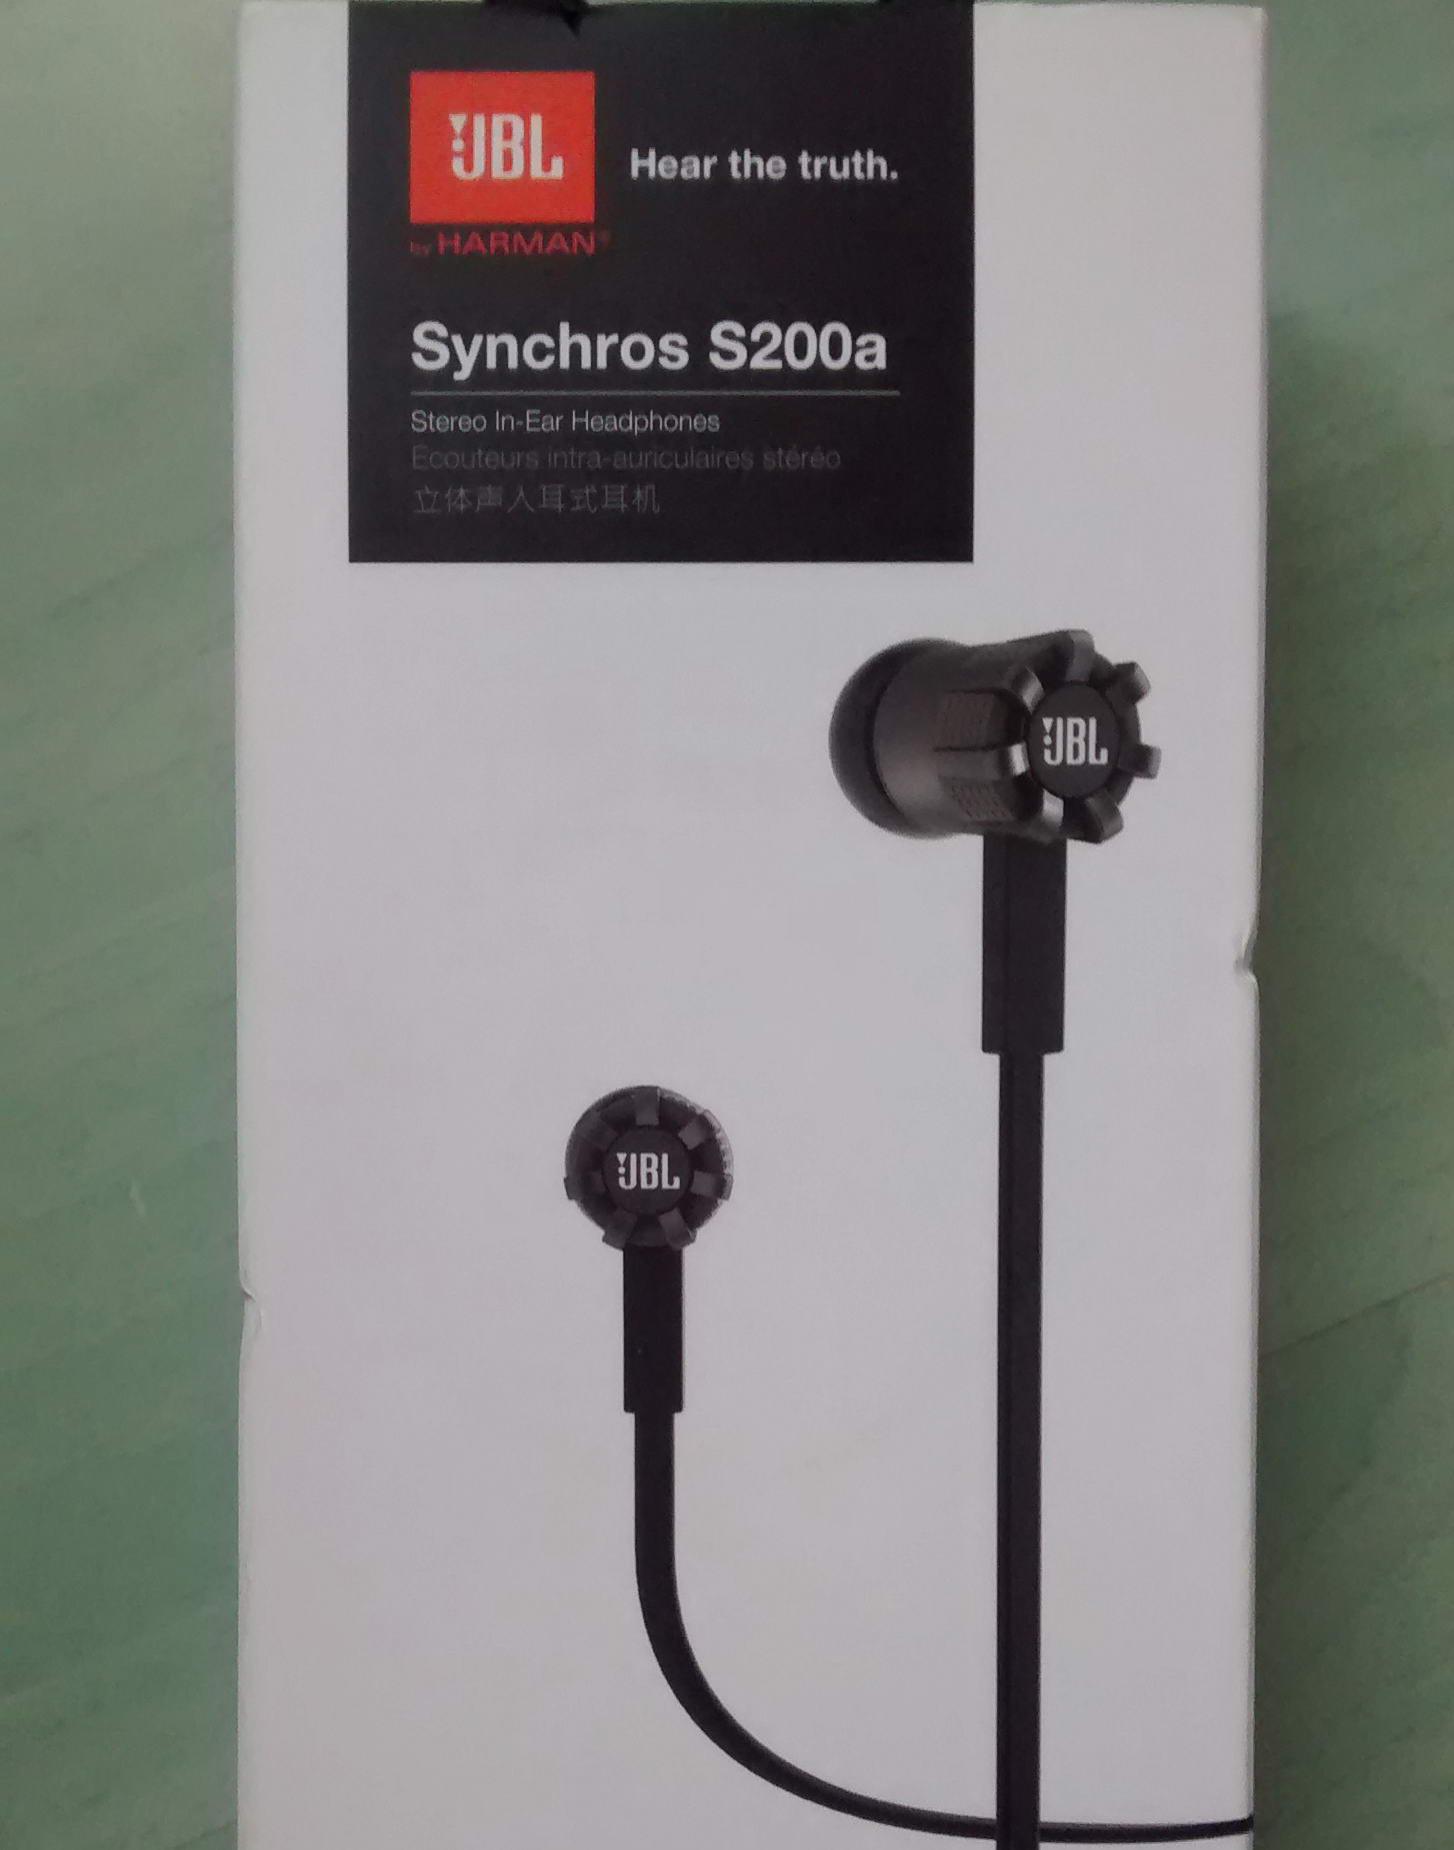 Ecouteurs JBL Synchros S200a